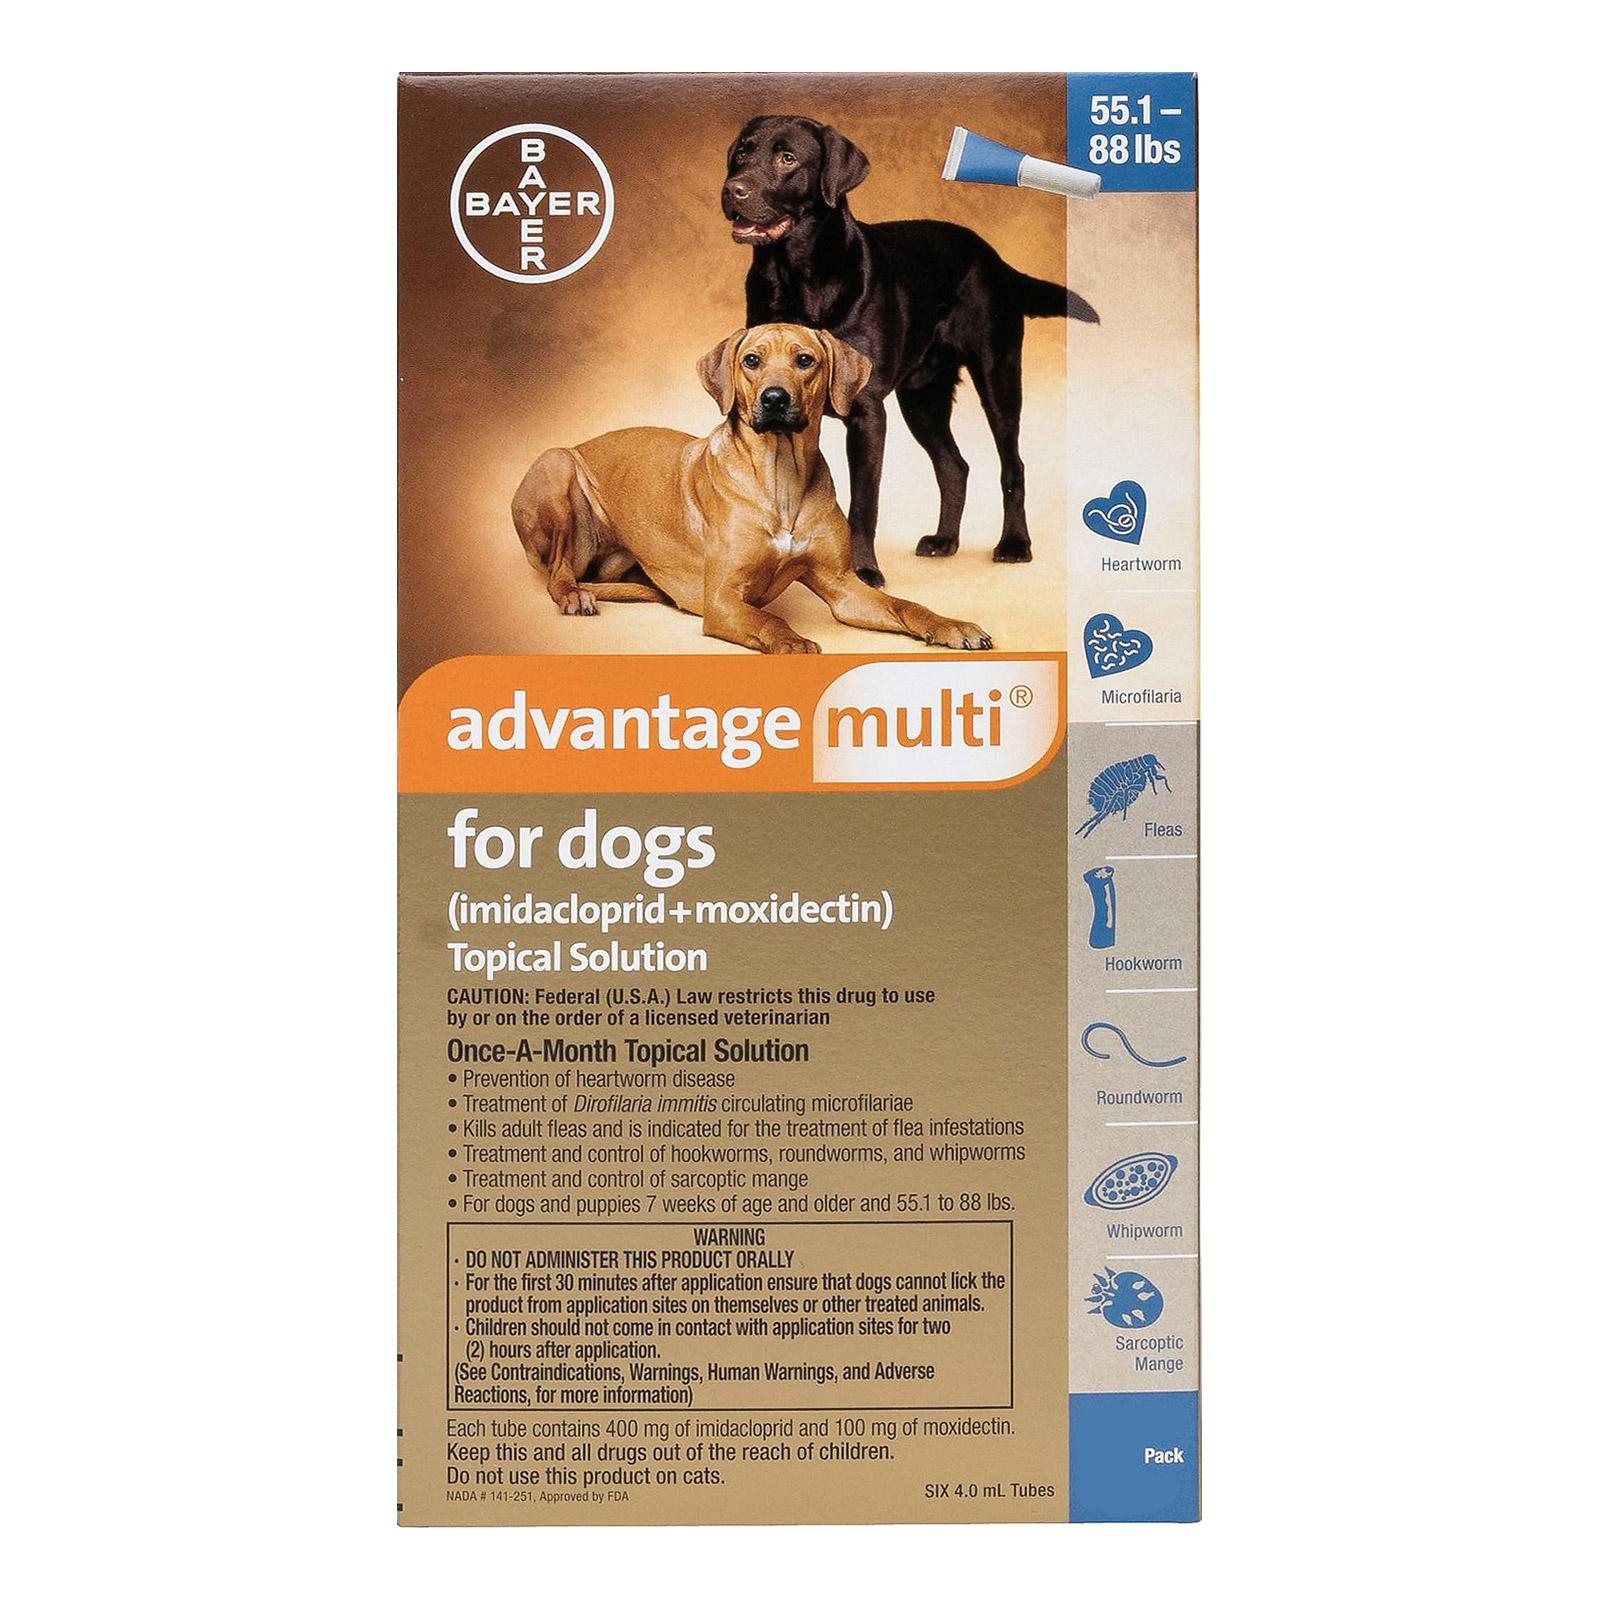 Advantage multi advocate extra large dogs 55 1 88 lbs blue